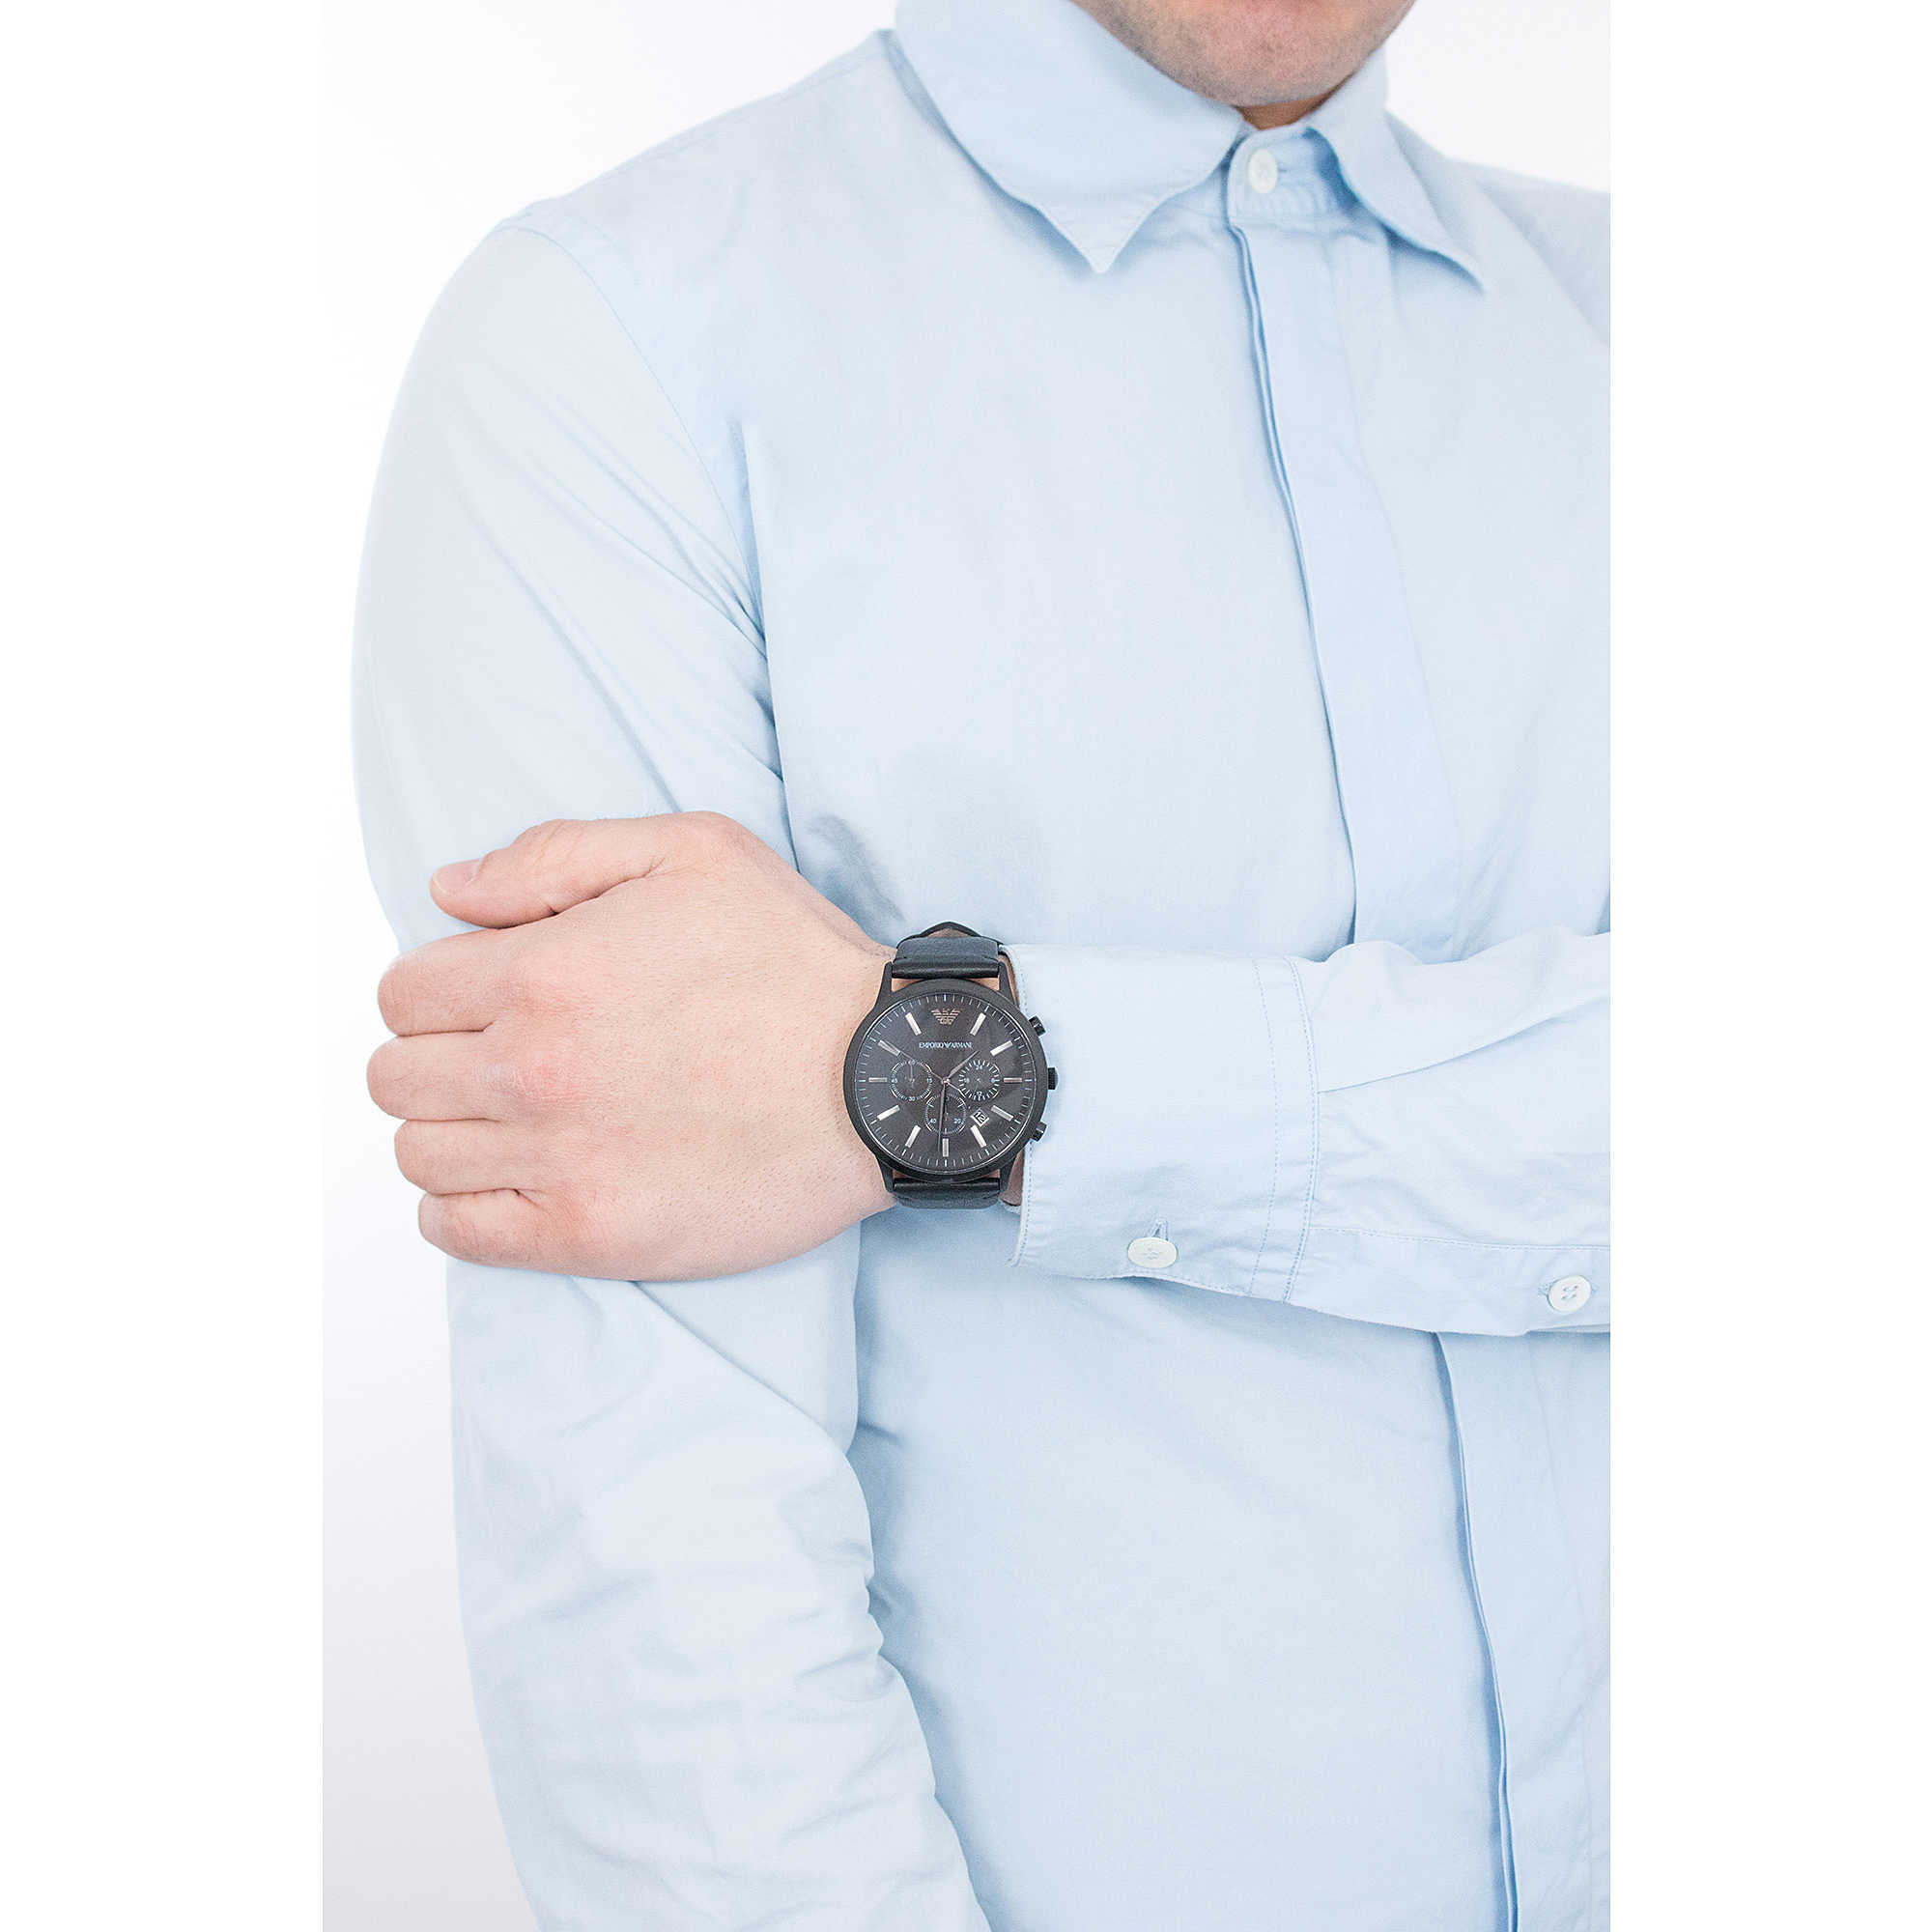 19b42c6bf watch chronograph man Emporio Armani AR2461 chronographs Emporio Armani